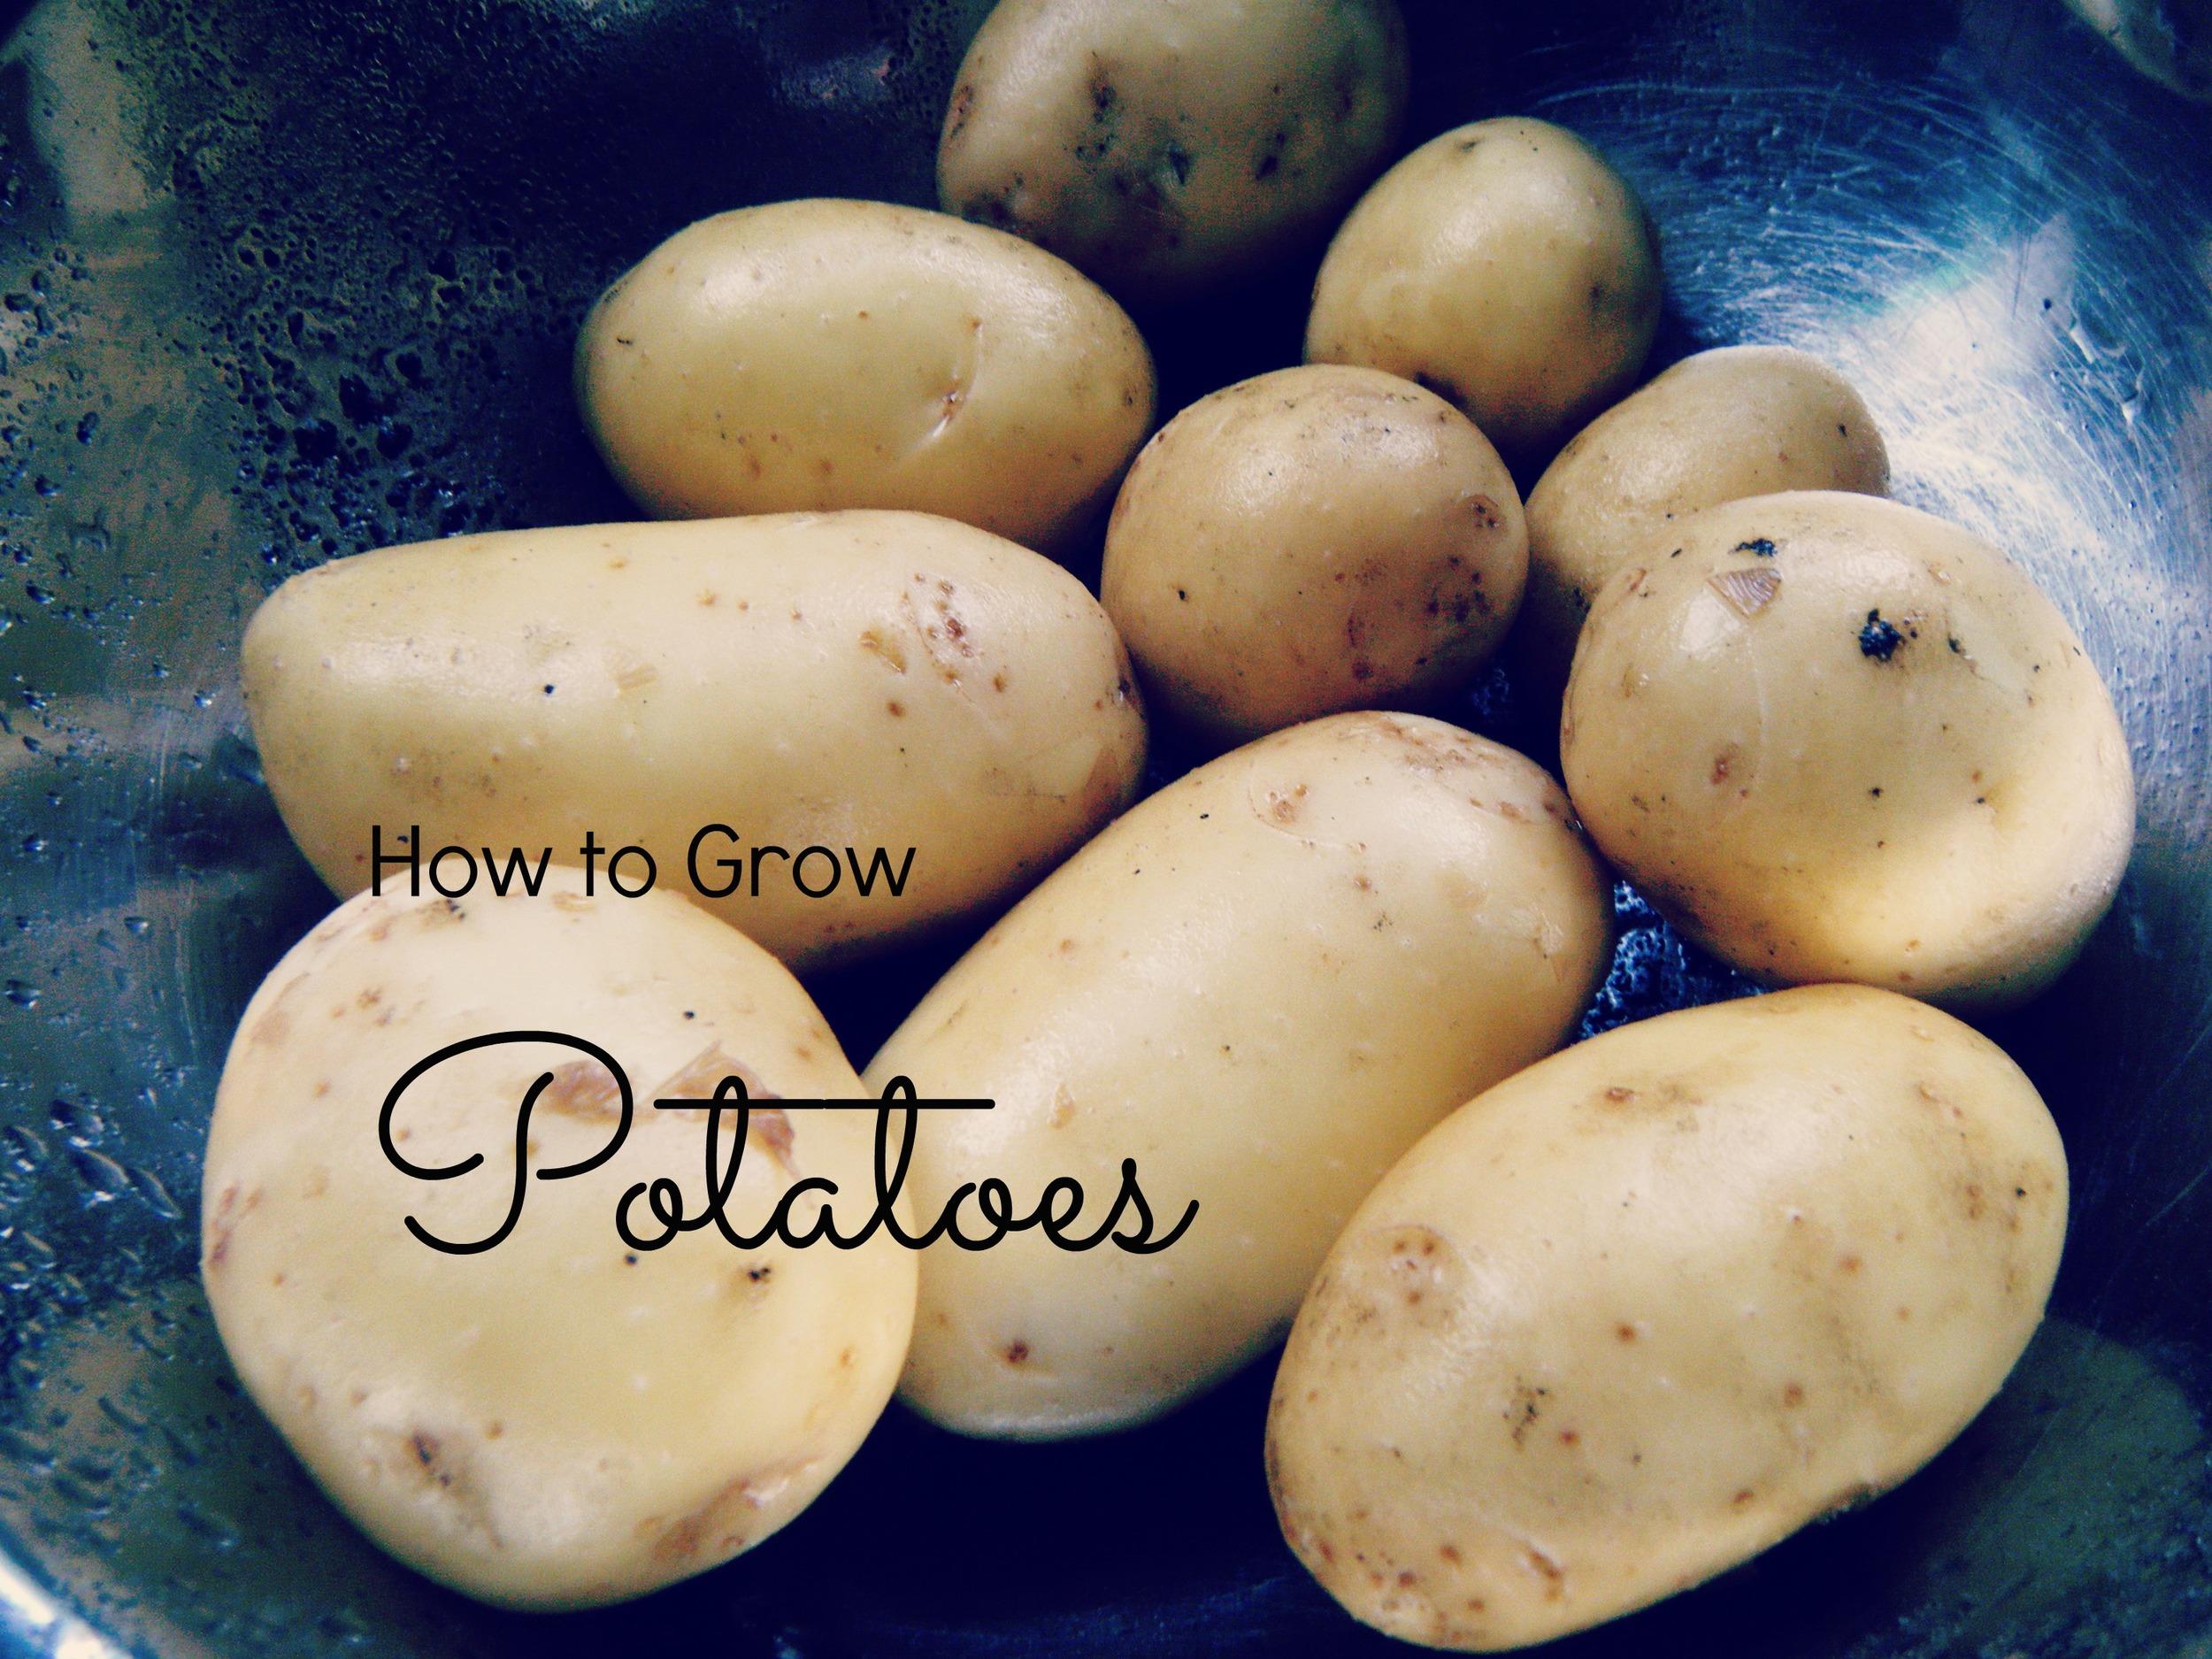 howtogrowpotatoes